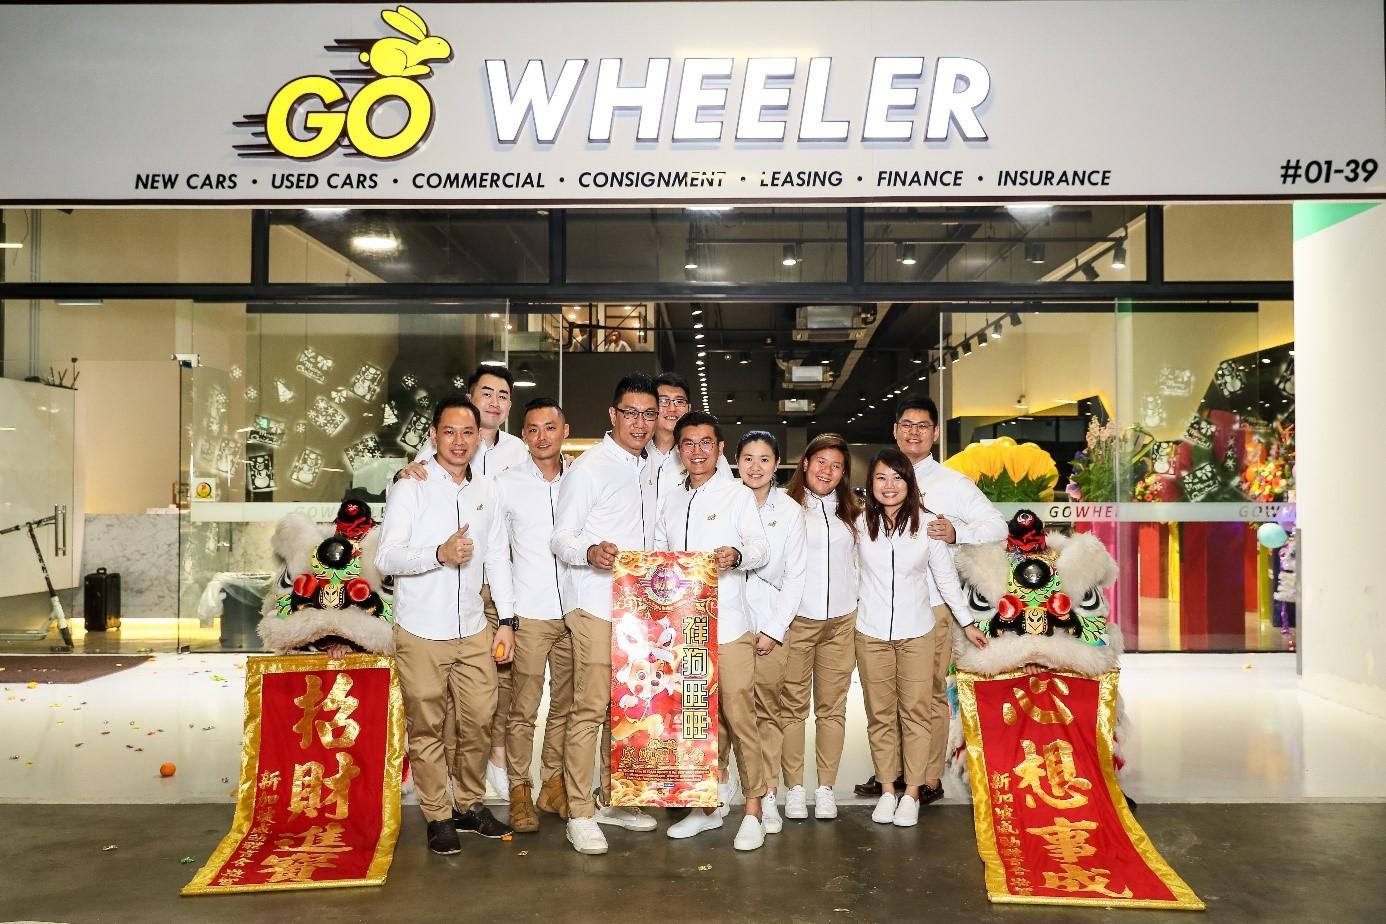 Gowheeler Team